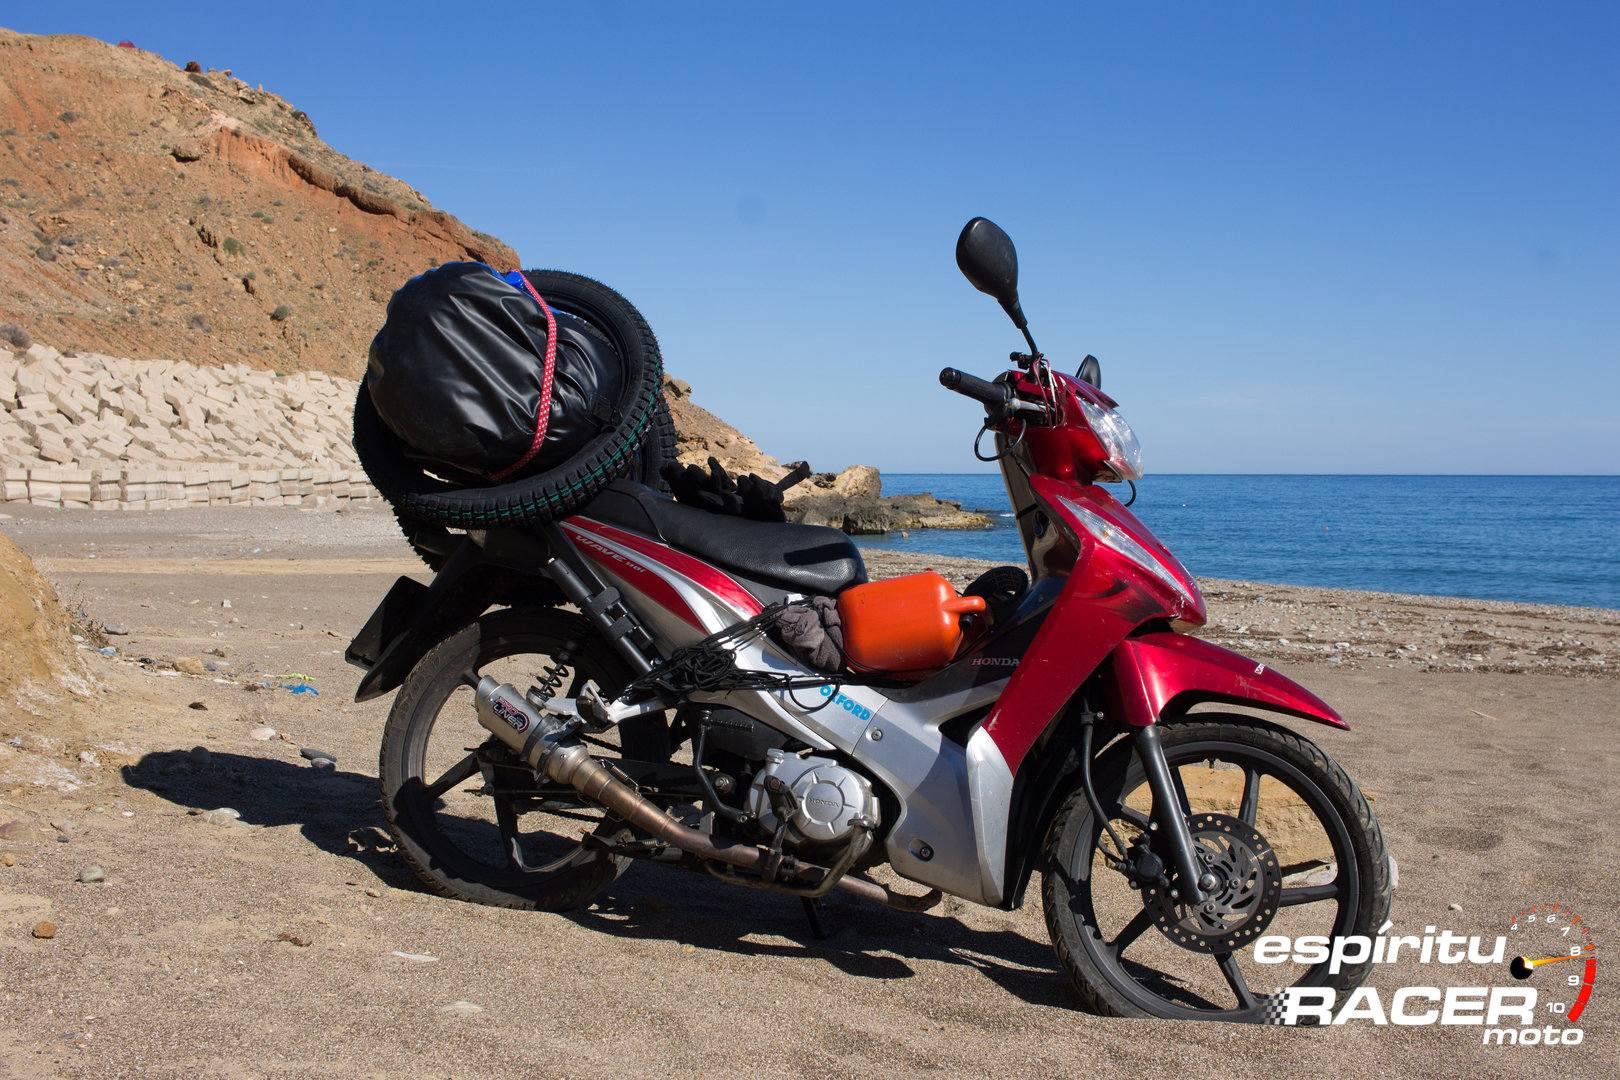 Marruecos En Moto 70